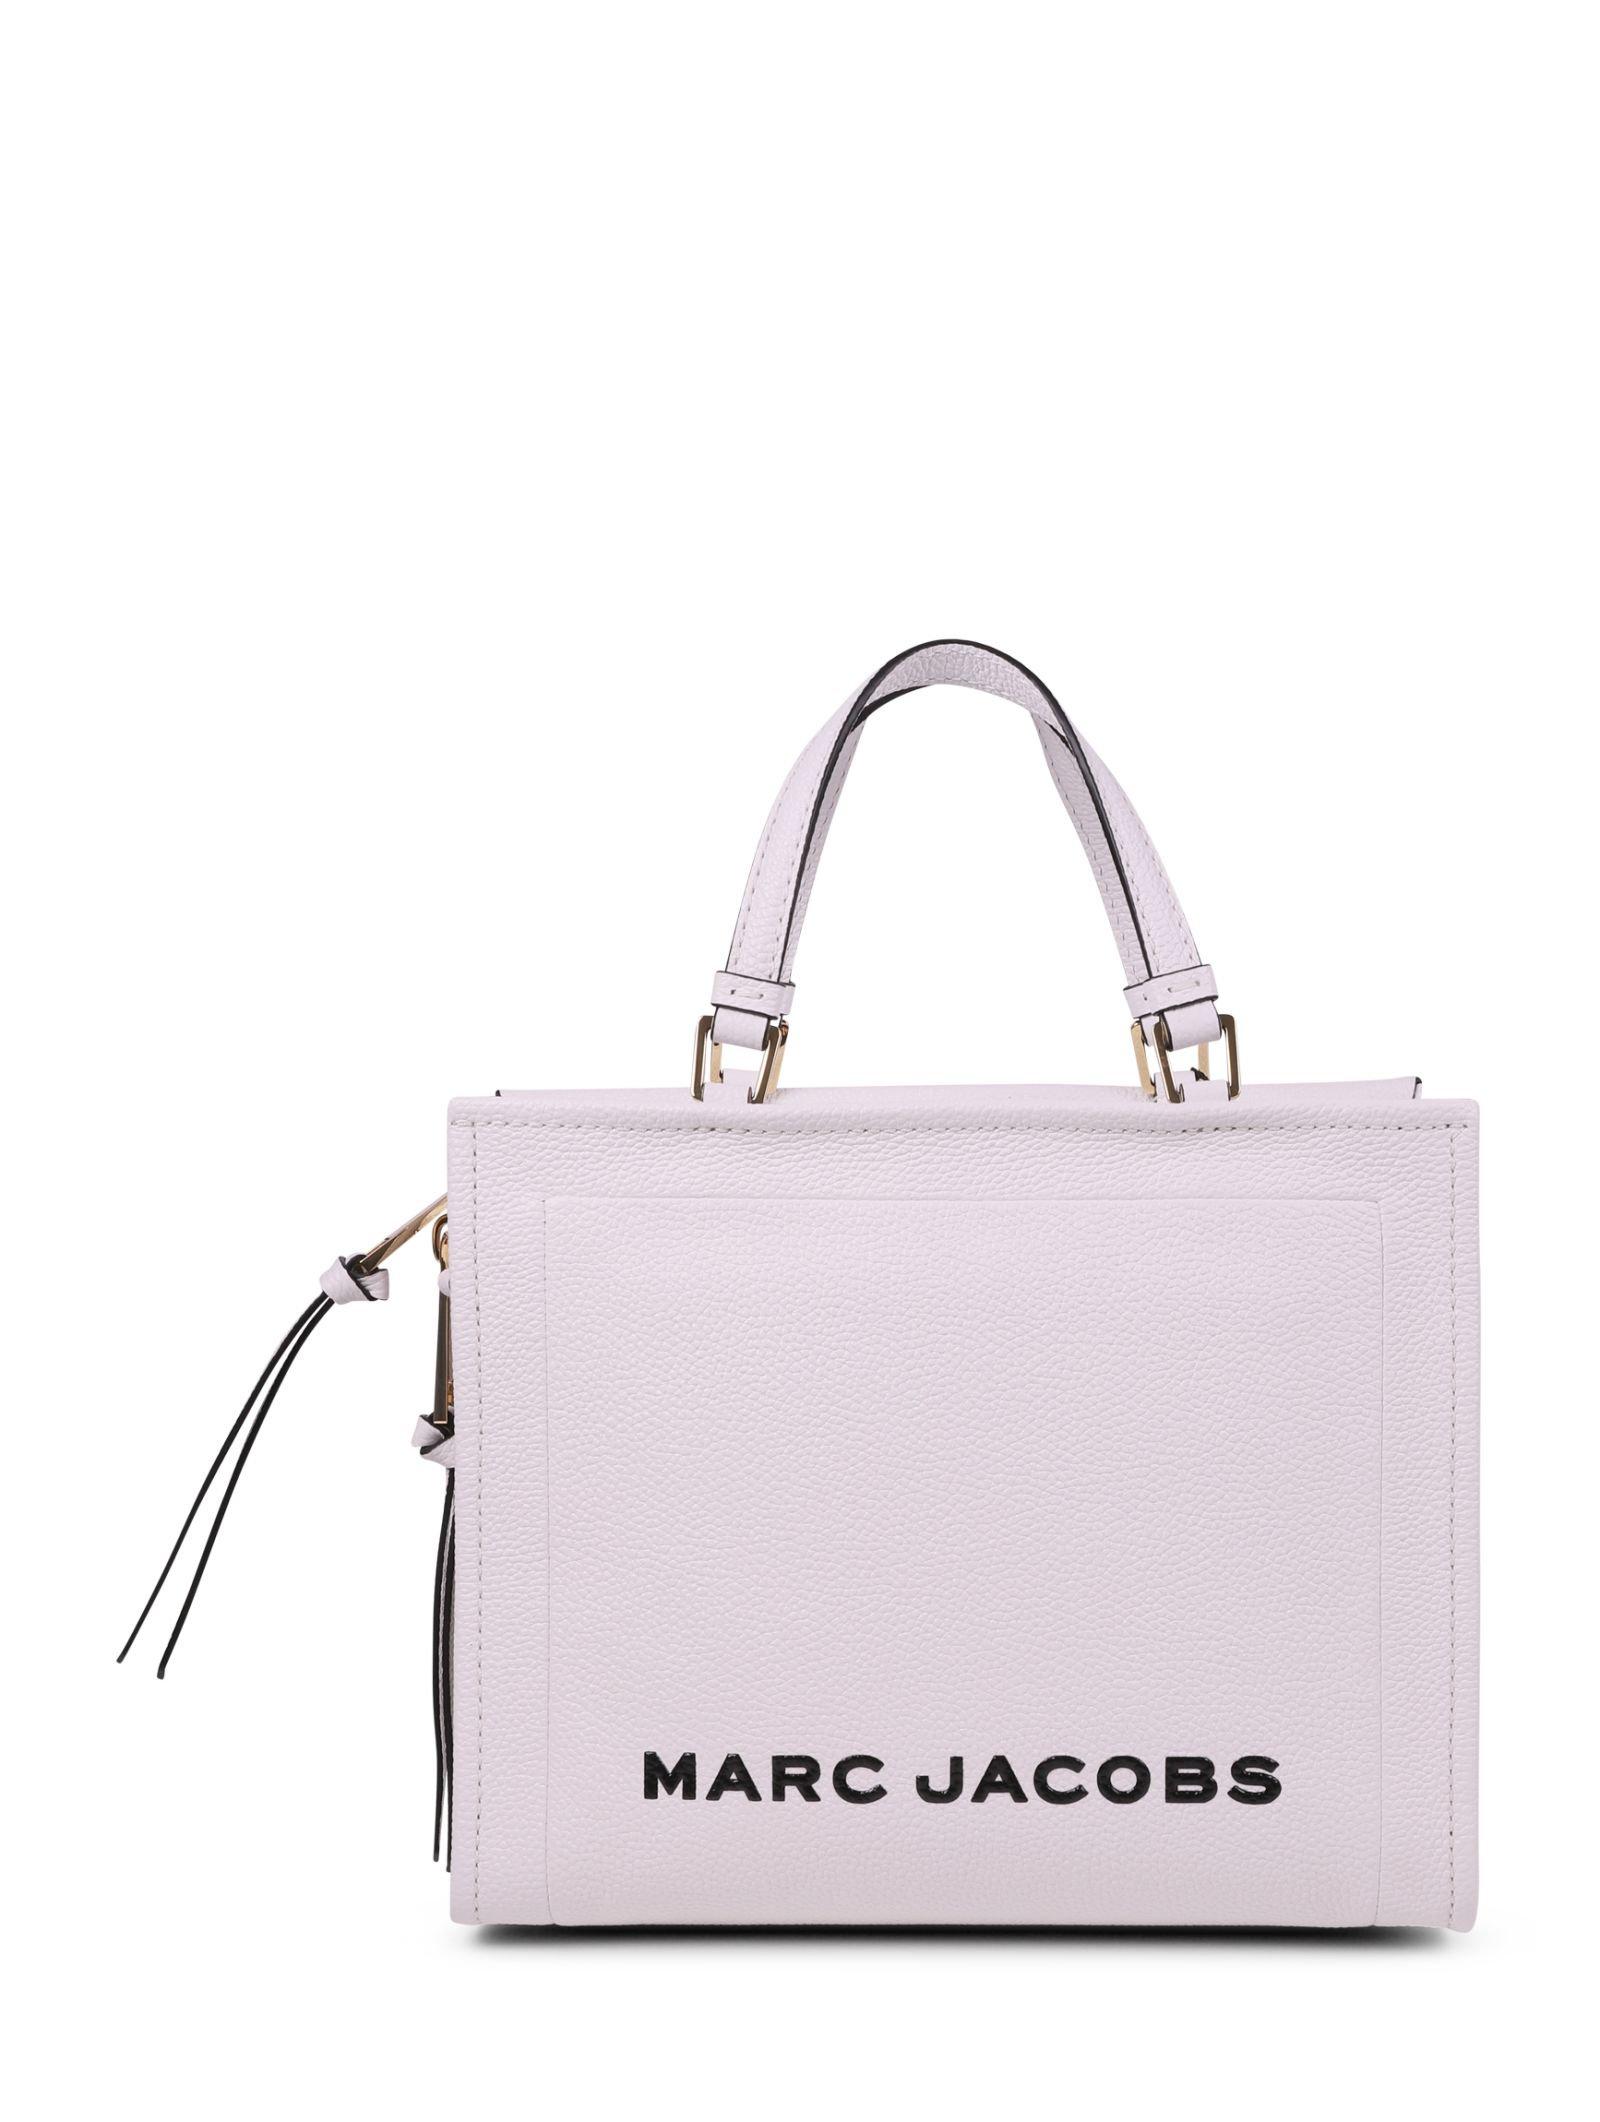 Marc Jacobs White Box Shopper 29 Tote